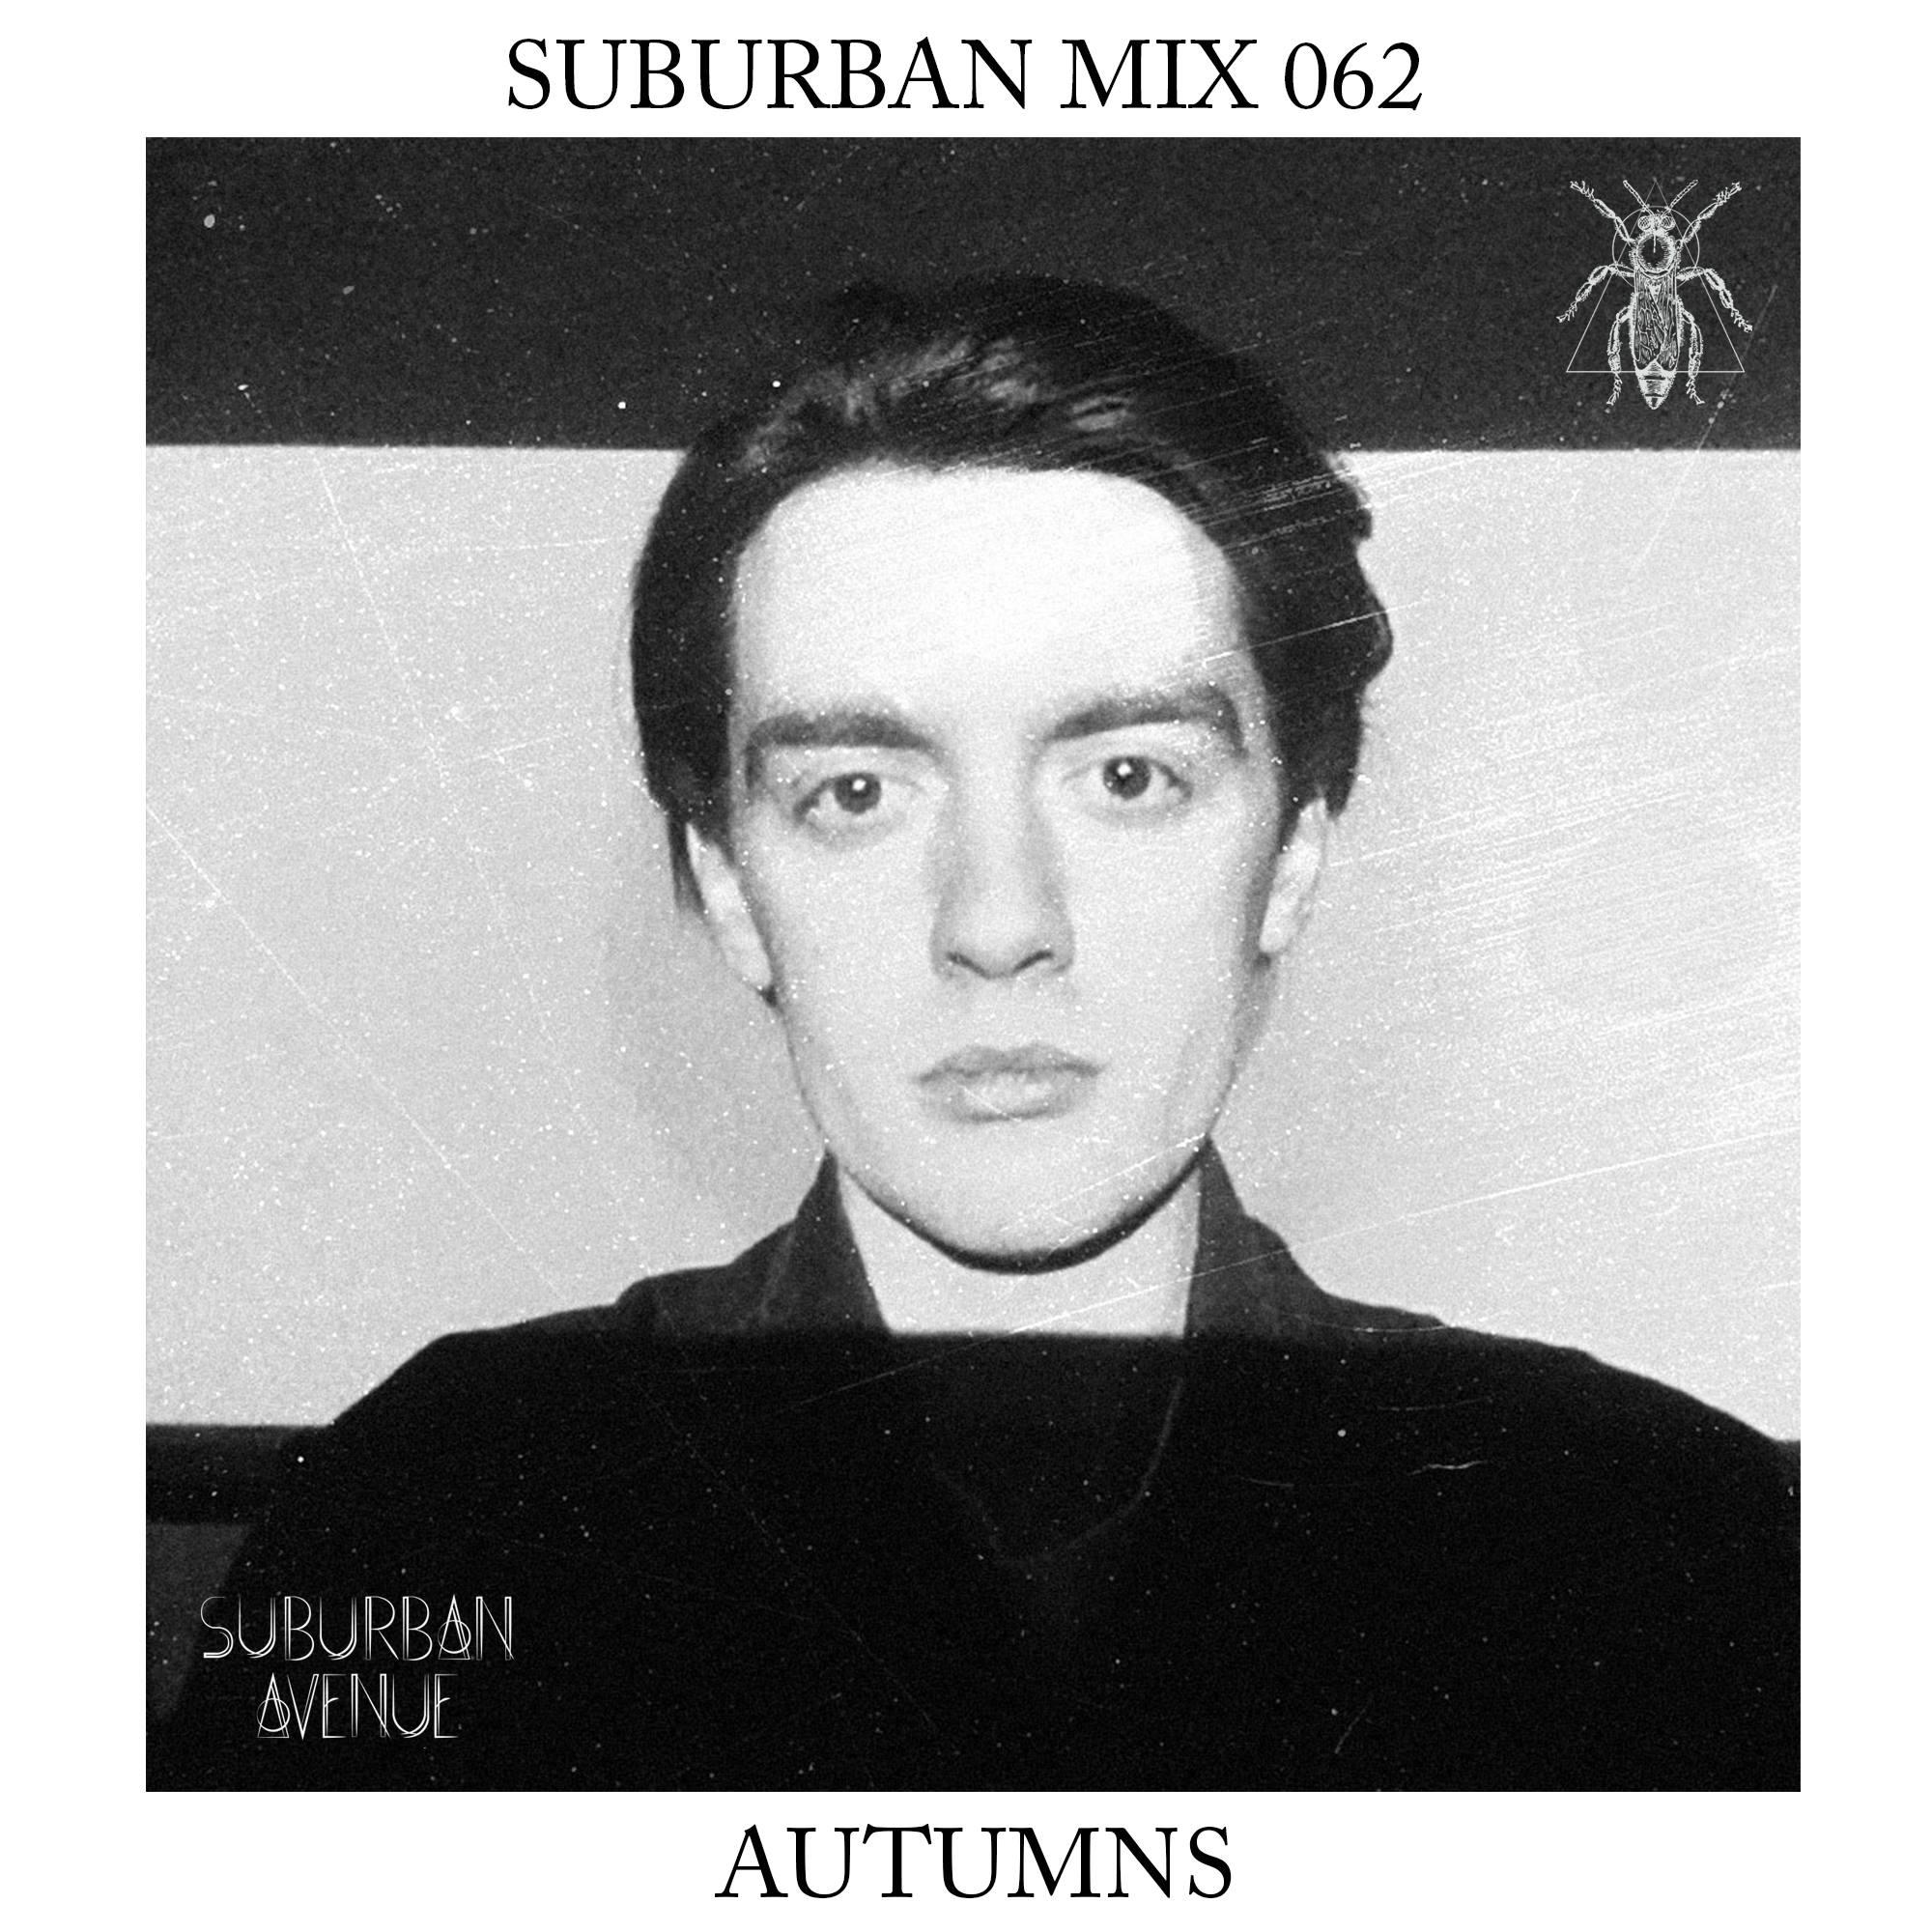 Suburban Mix 062 - Autumns